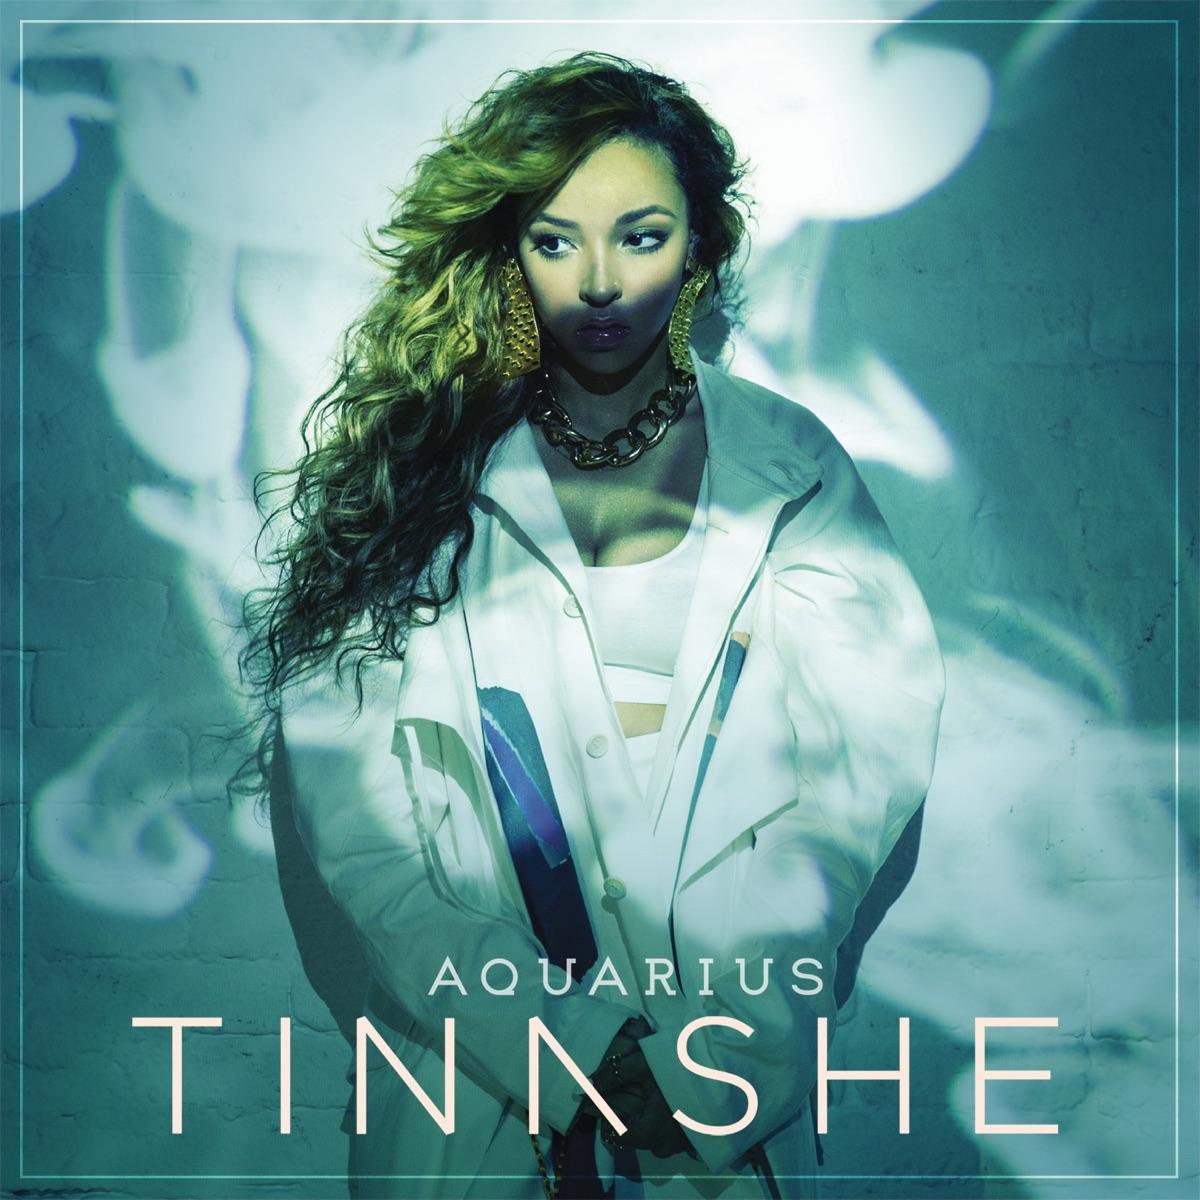 Aquarius Tinashe CD cover